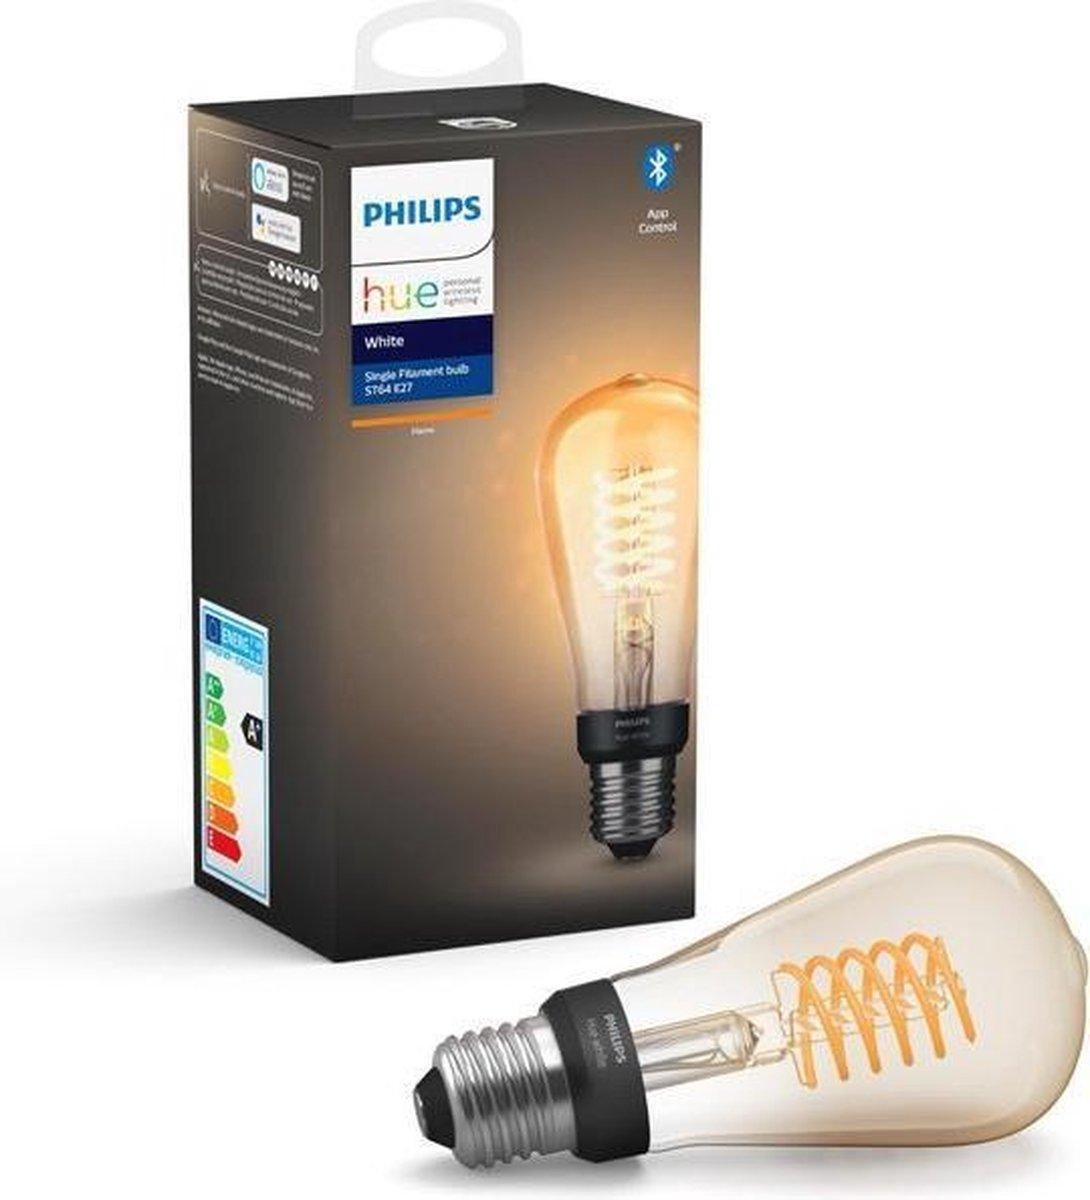 Philips Hue Slimme Verlichting Filamentlamp ST64 Edison -  Ø 60 mm - White - E27 - Bluetooth